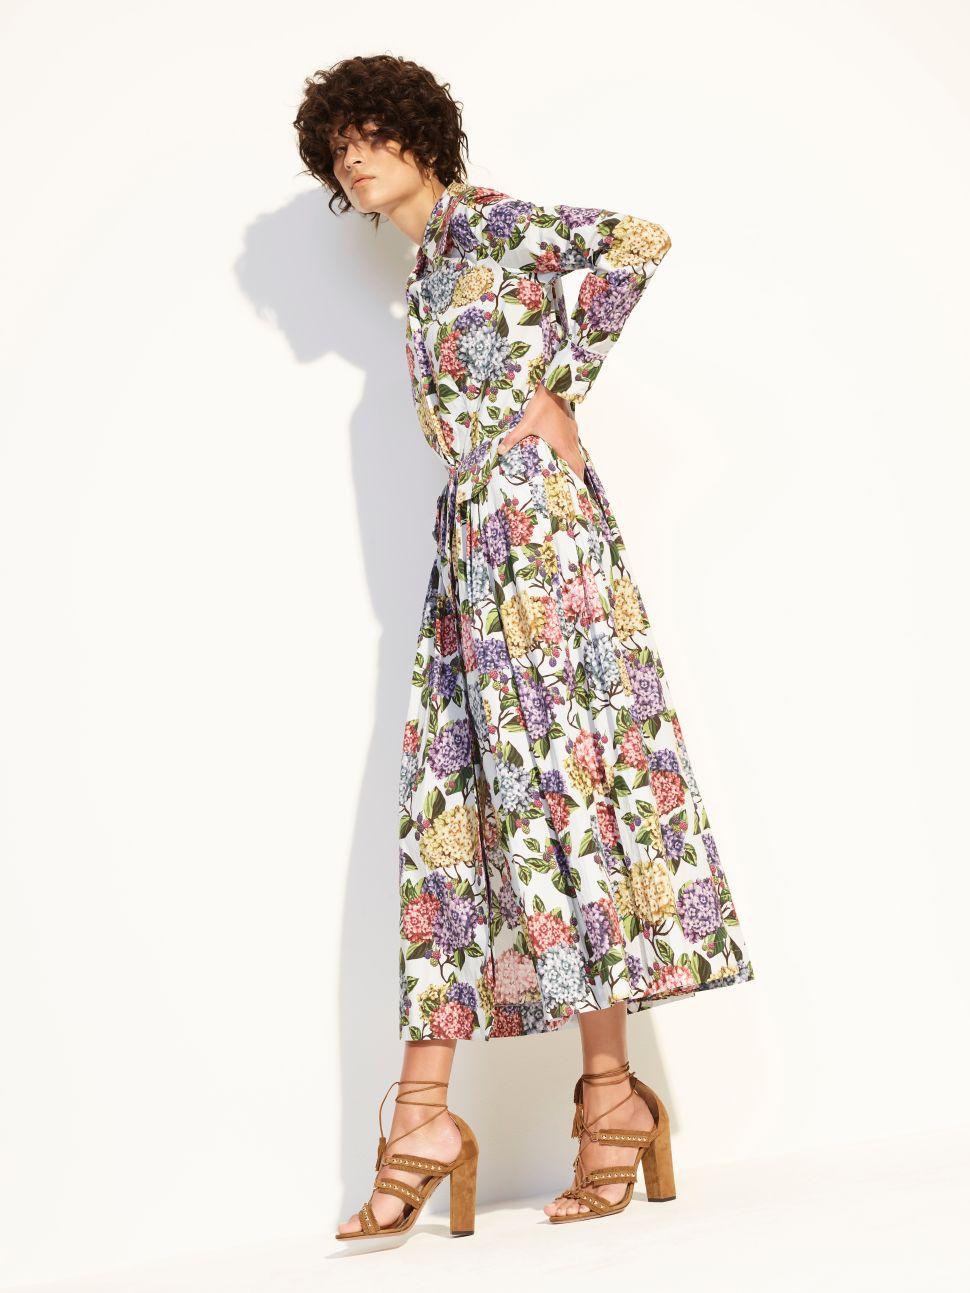 Emilia Wickstead Has Created the Perfect Summer Dress